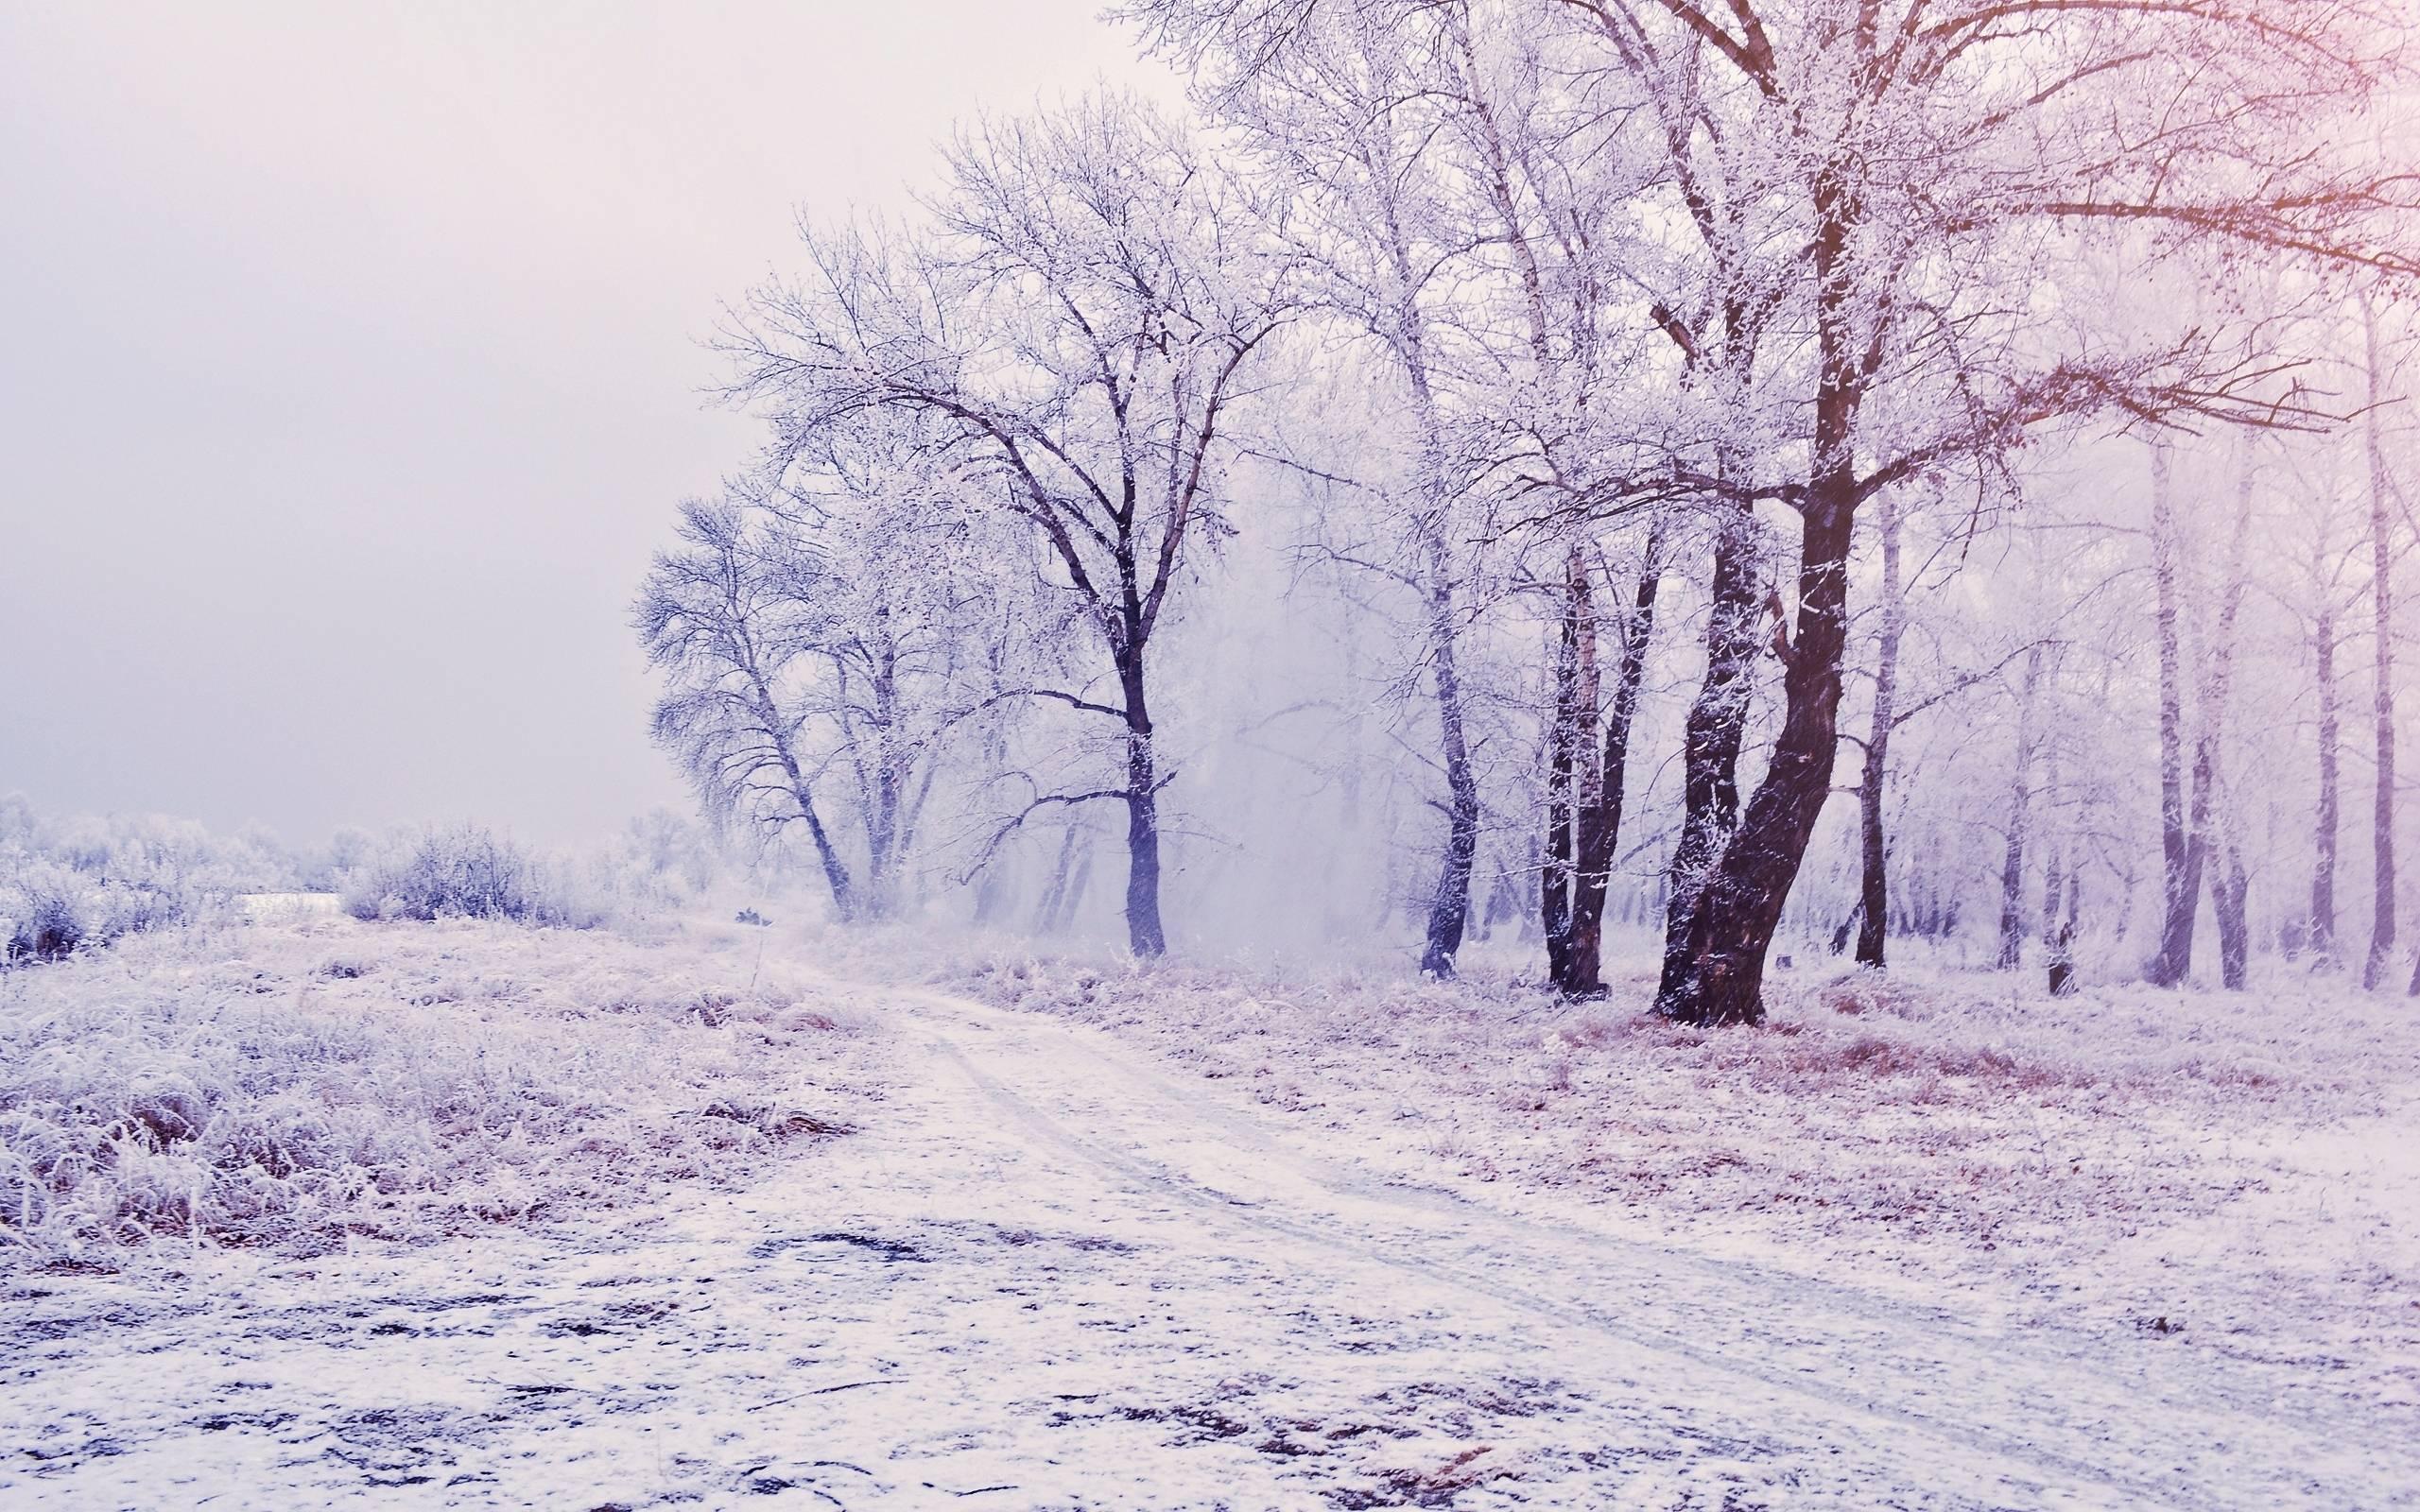 ilona wallpapers beautiful snowy - photo #10